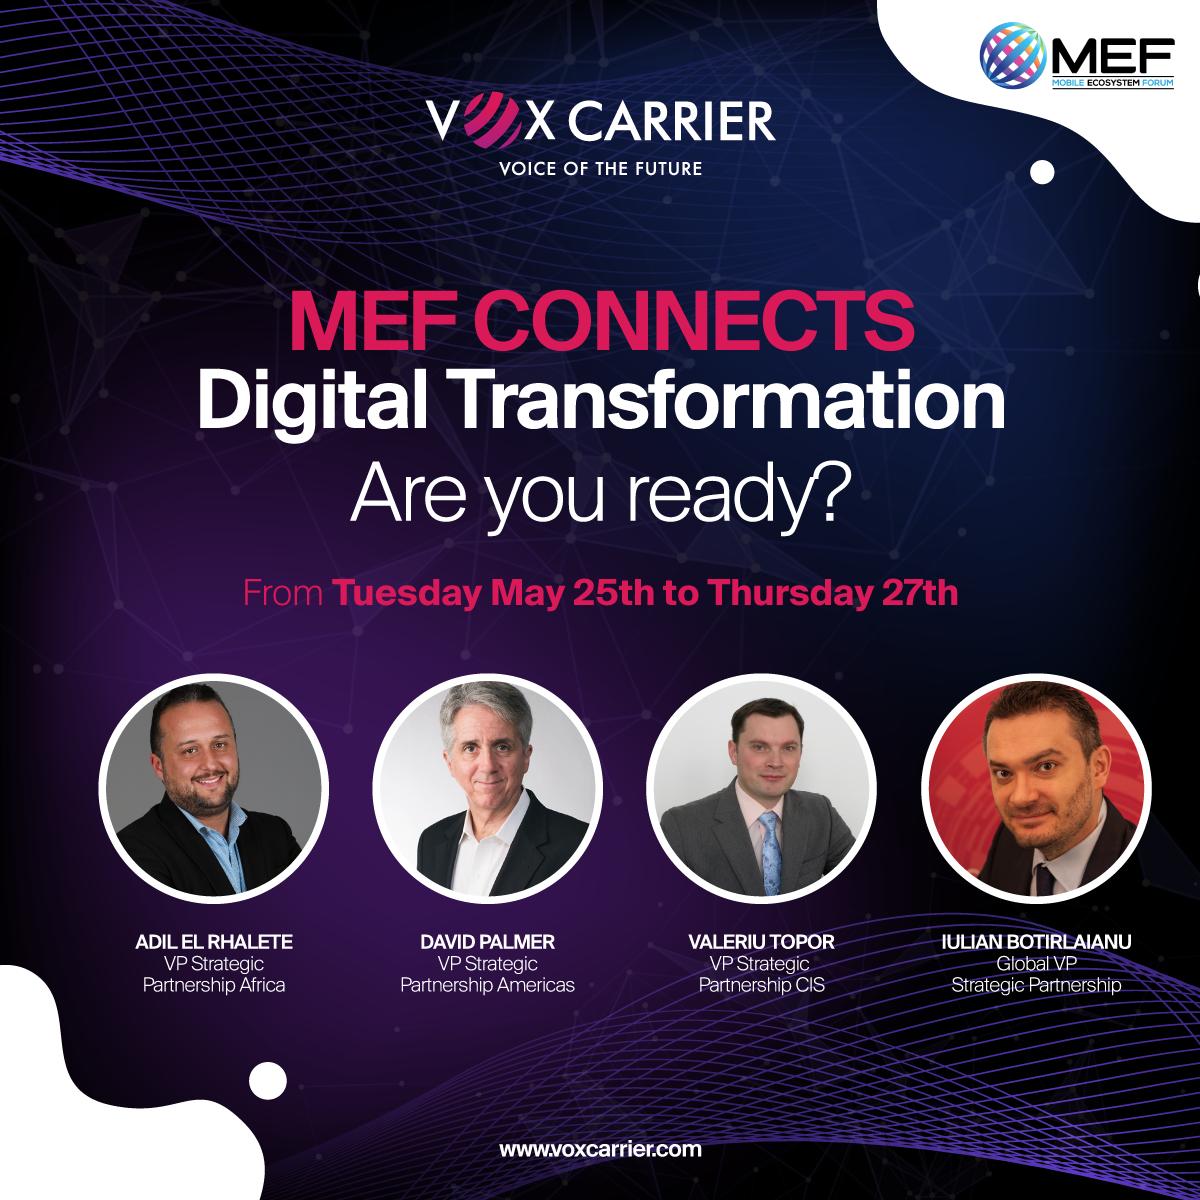 MEF Connects Digital Transformation